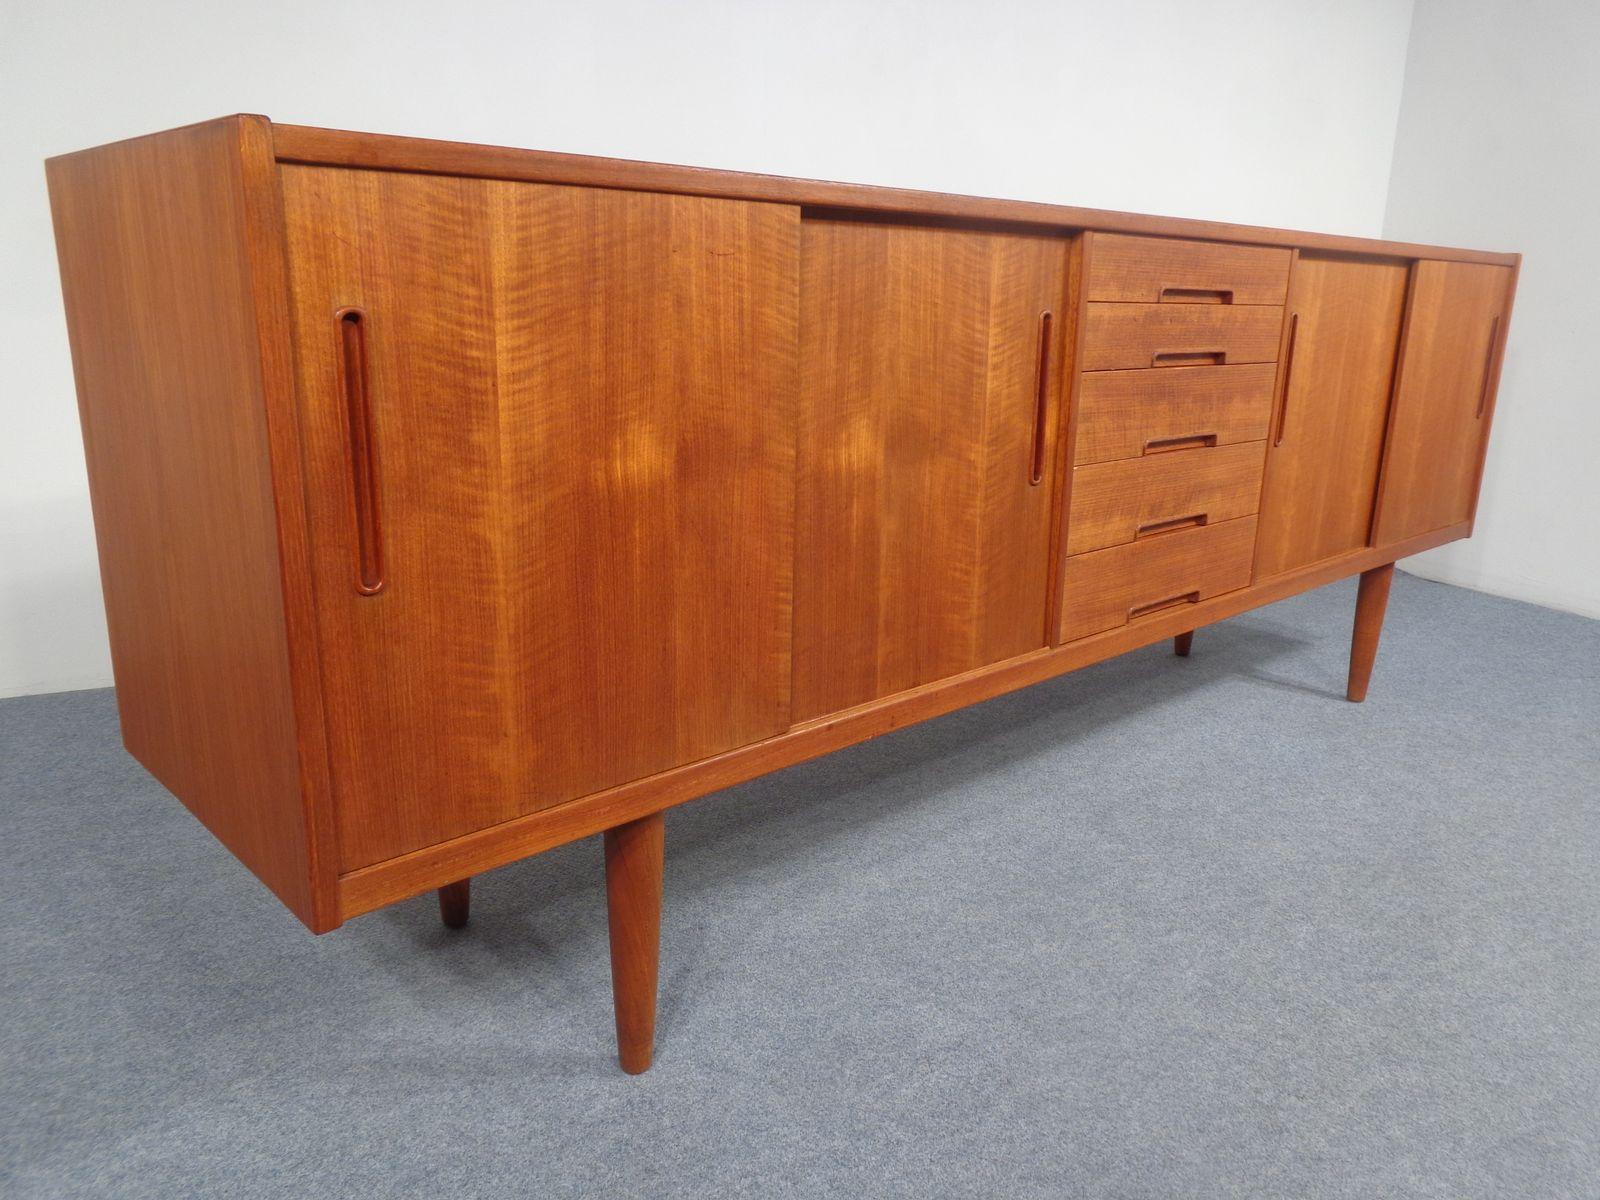 gro es vintage sideboard aus teak von nils jonsson f r. Black Bedroom Furniture Sets. Home Design Ideas